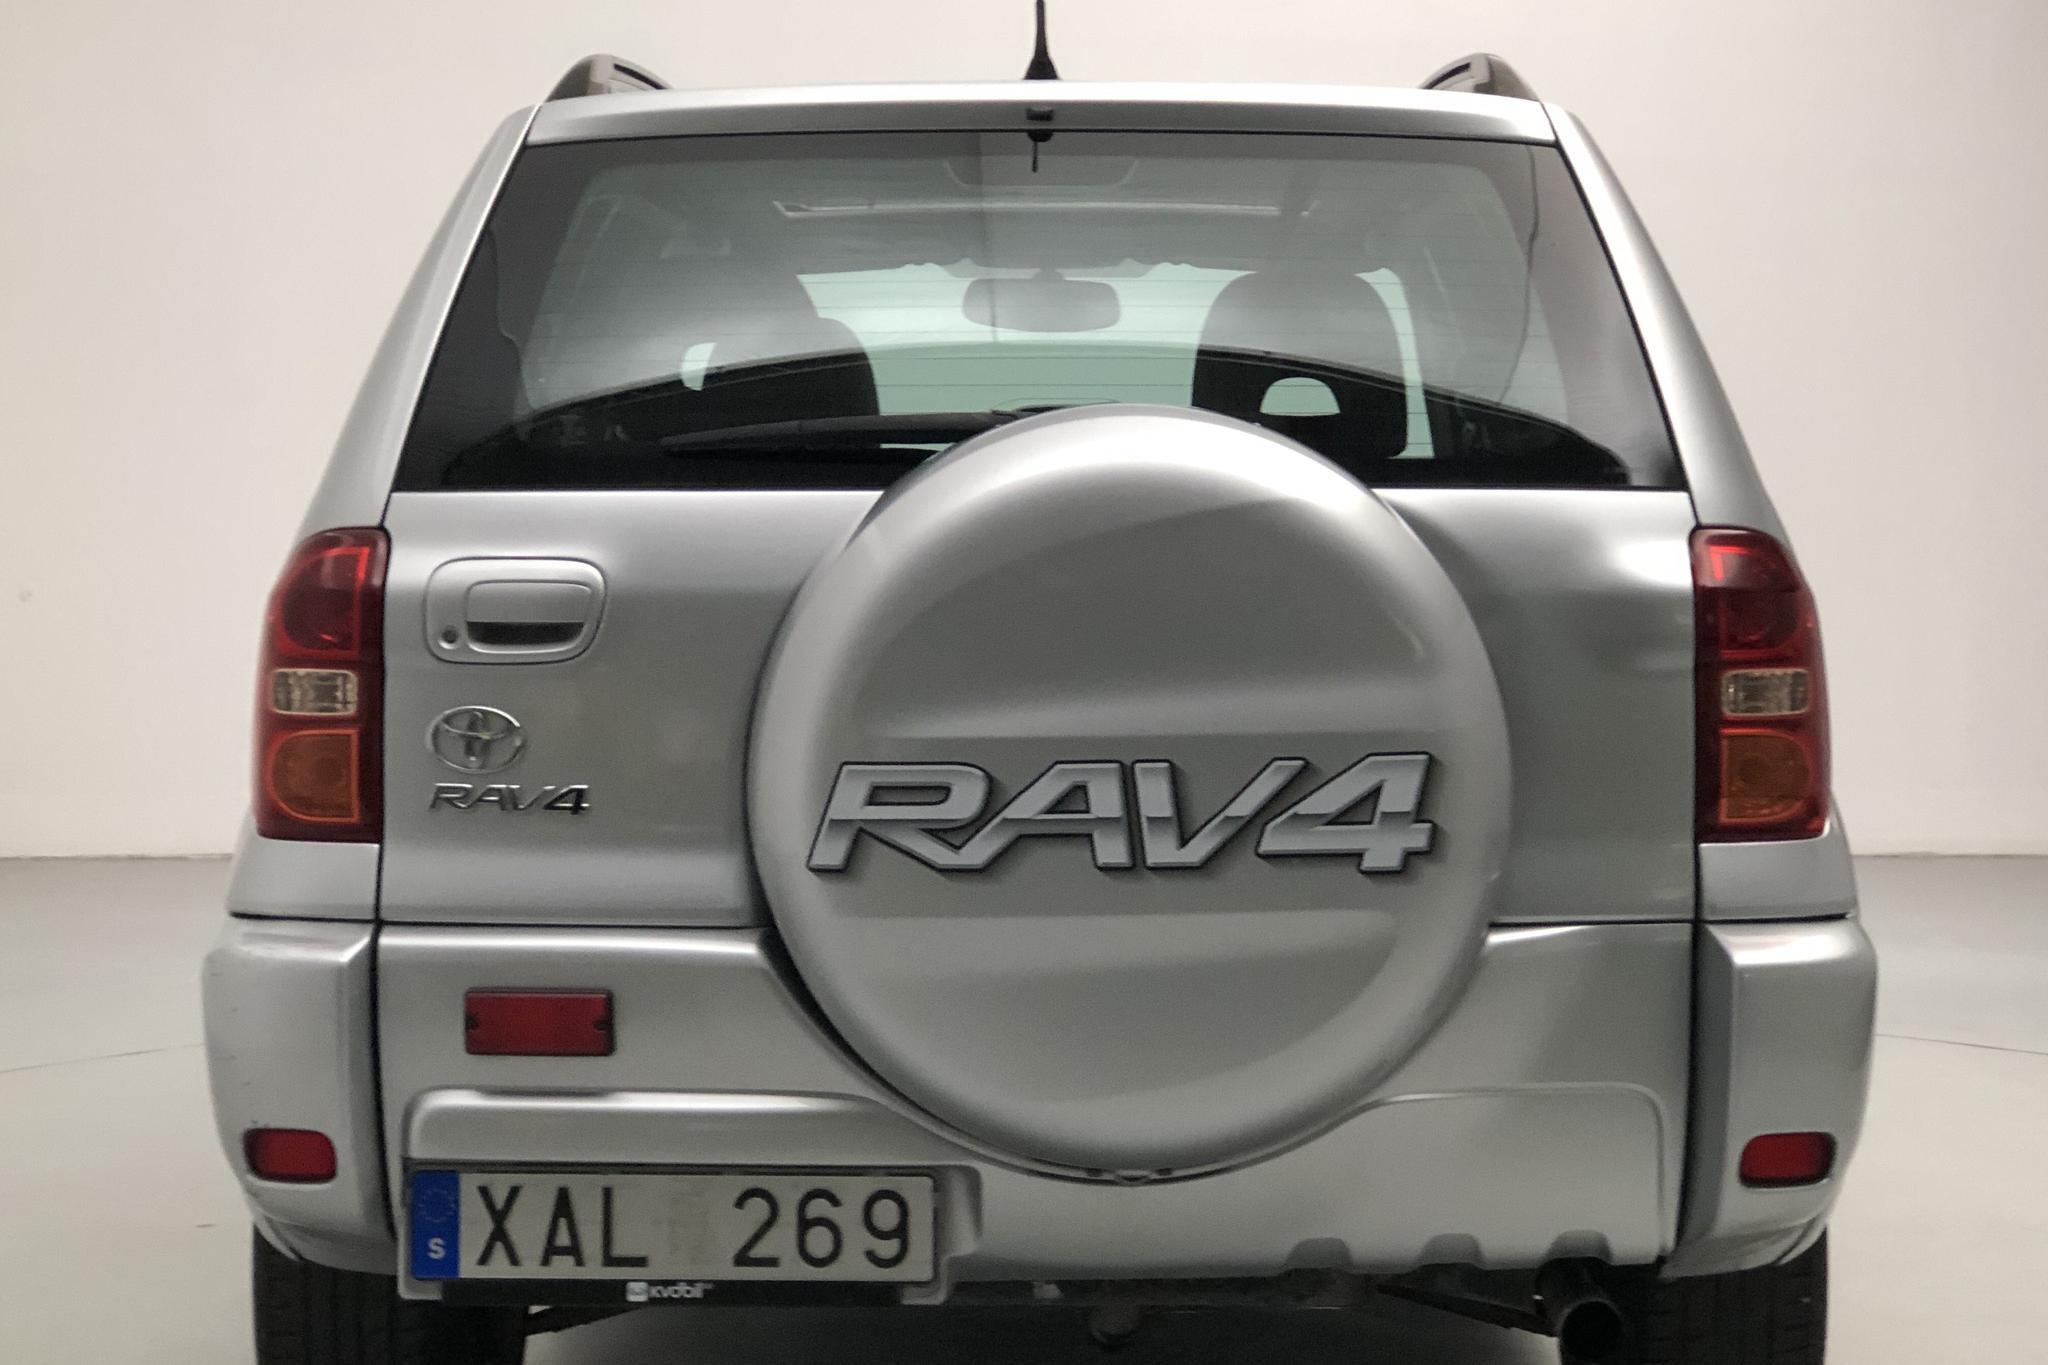 Toyota RAV4 2.0 5dr (150hk) - 12 507 mil - Manuell - silver - 2005